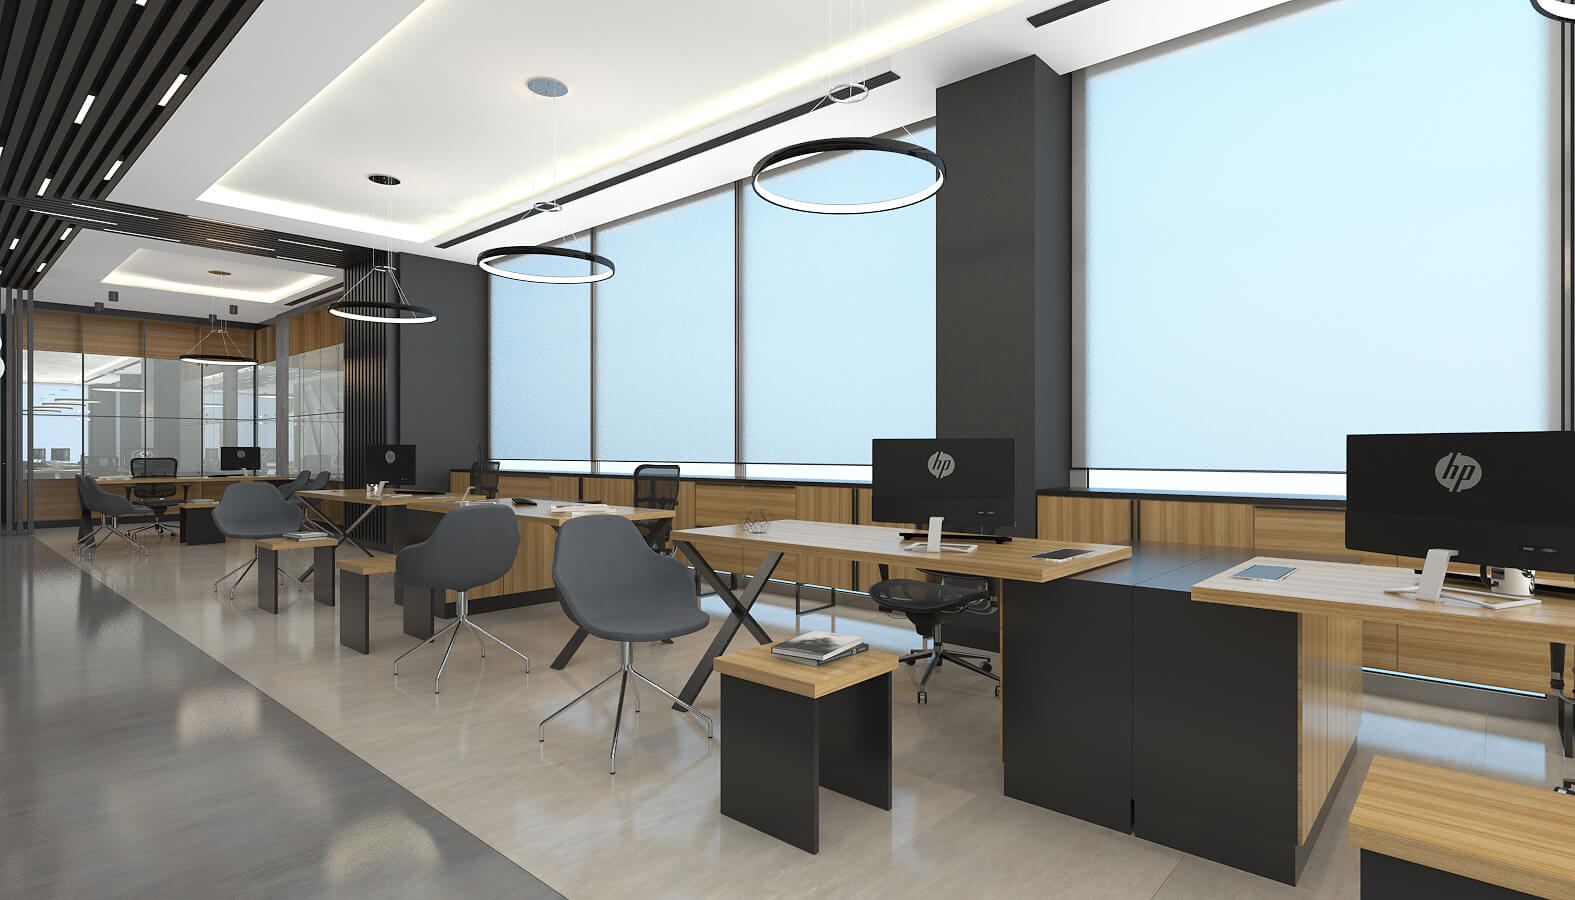 Shop design 3521 2B Energy Retail